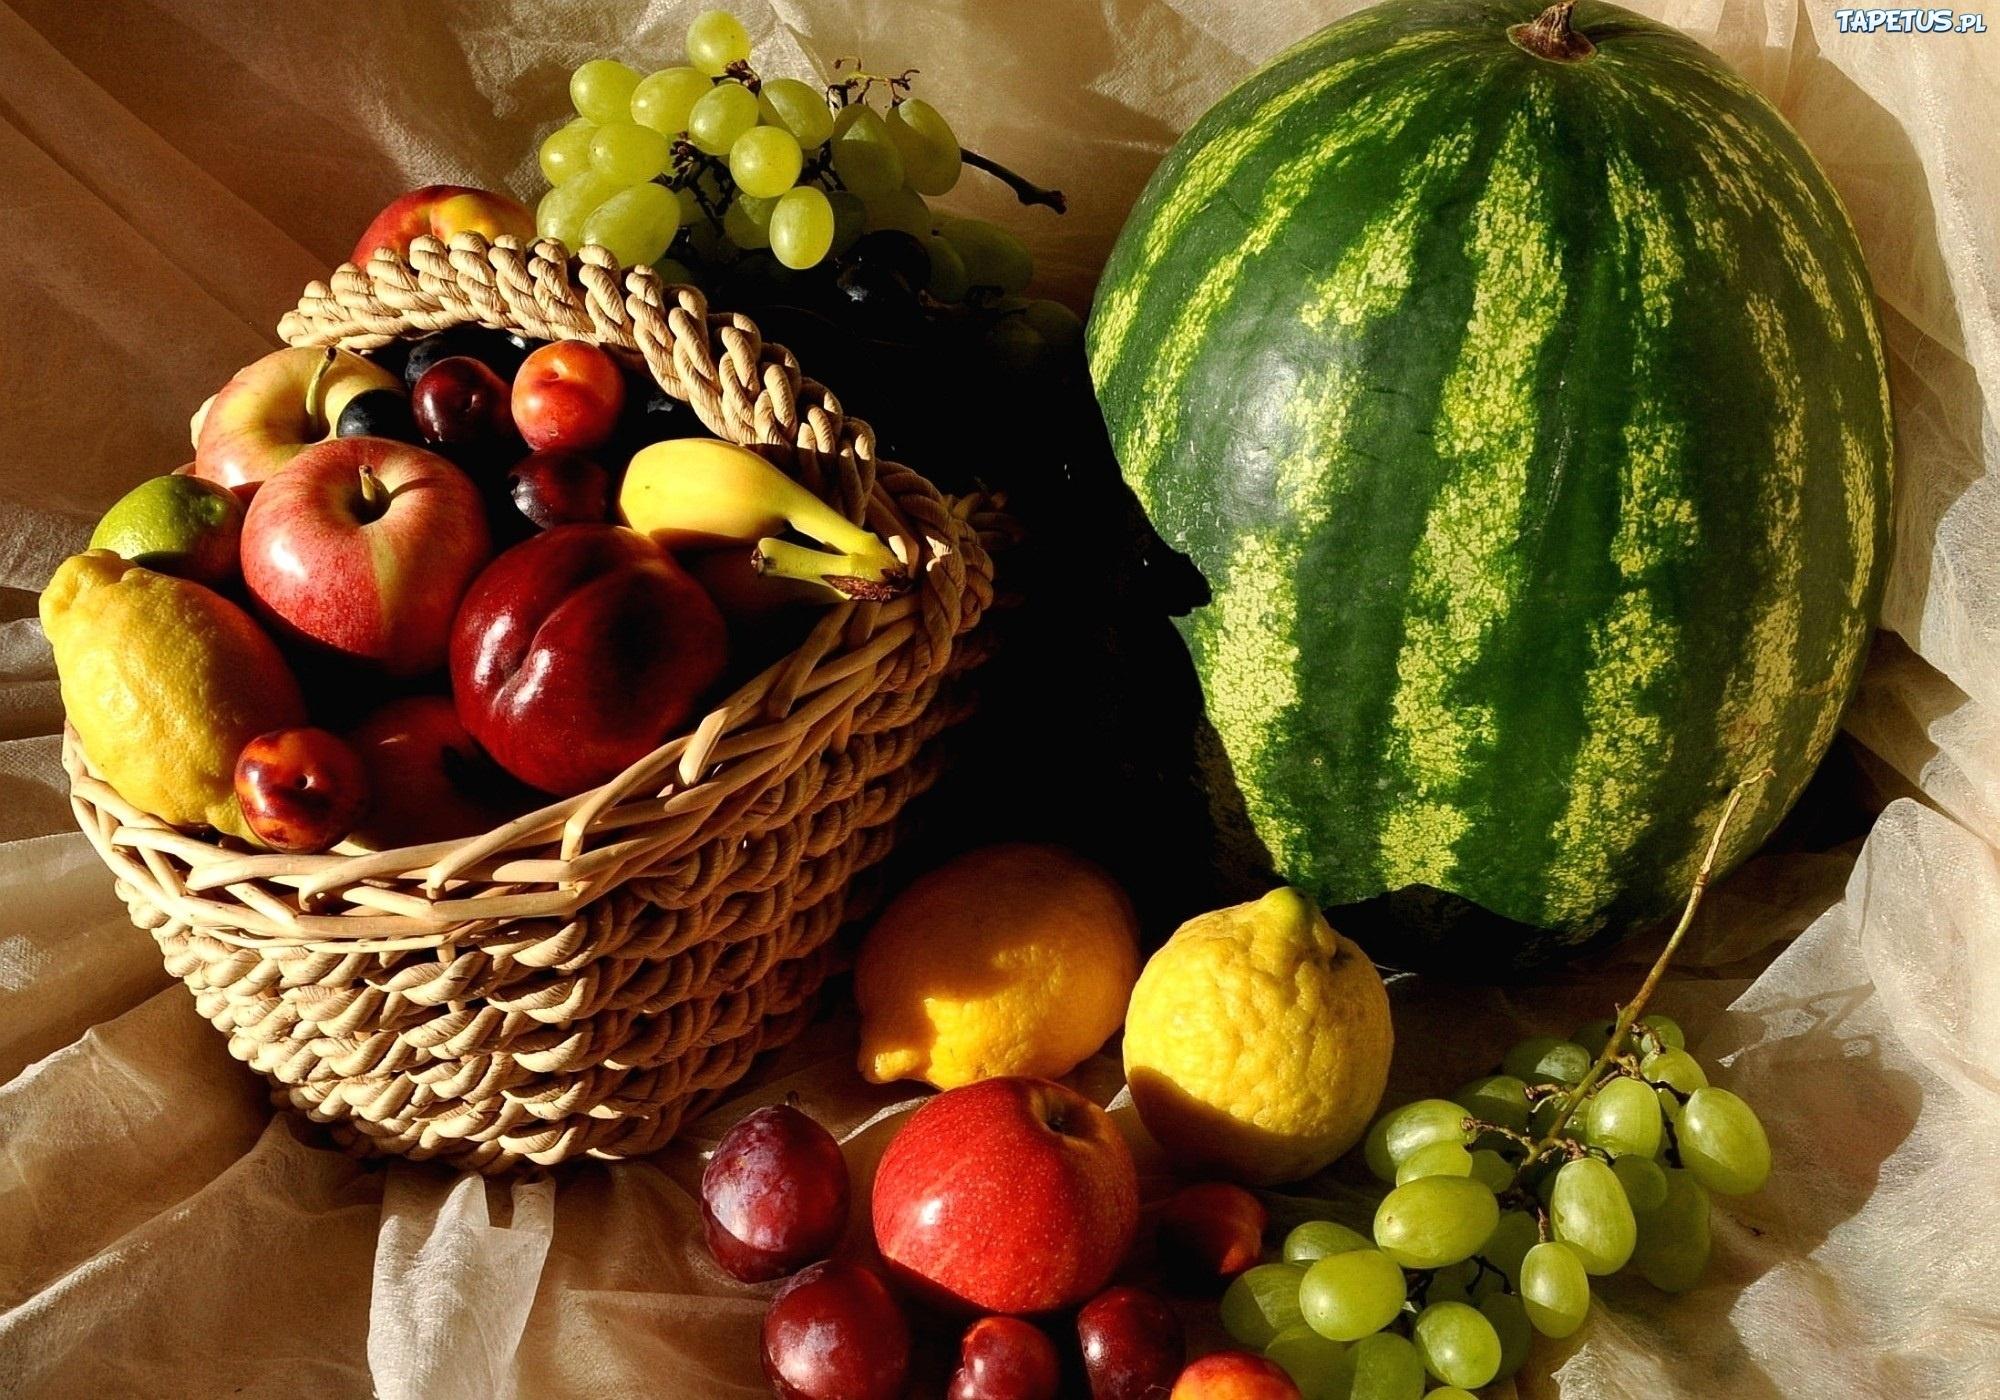 Еда фрукты корзина яблоки арбуз Food fruit basket apples watermelon без смс